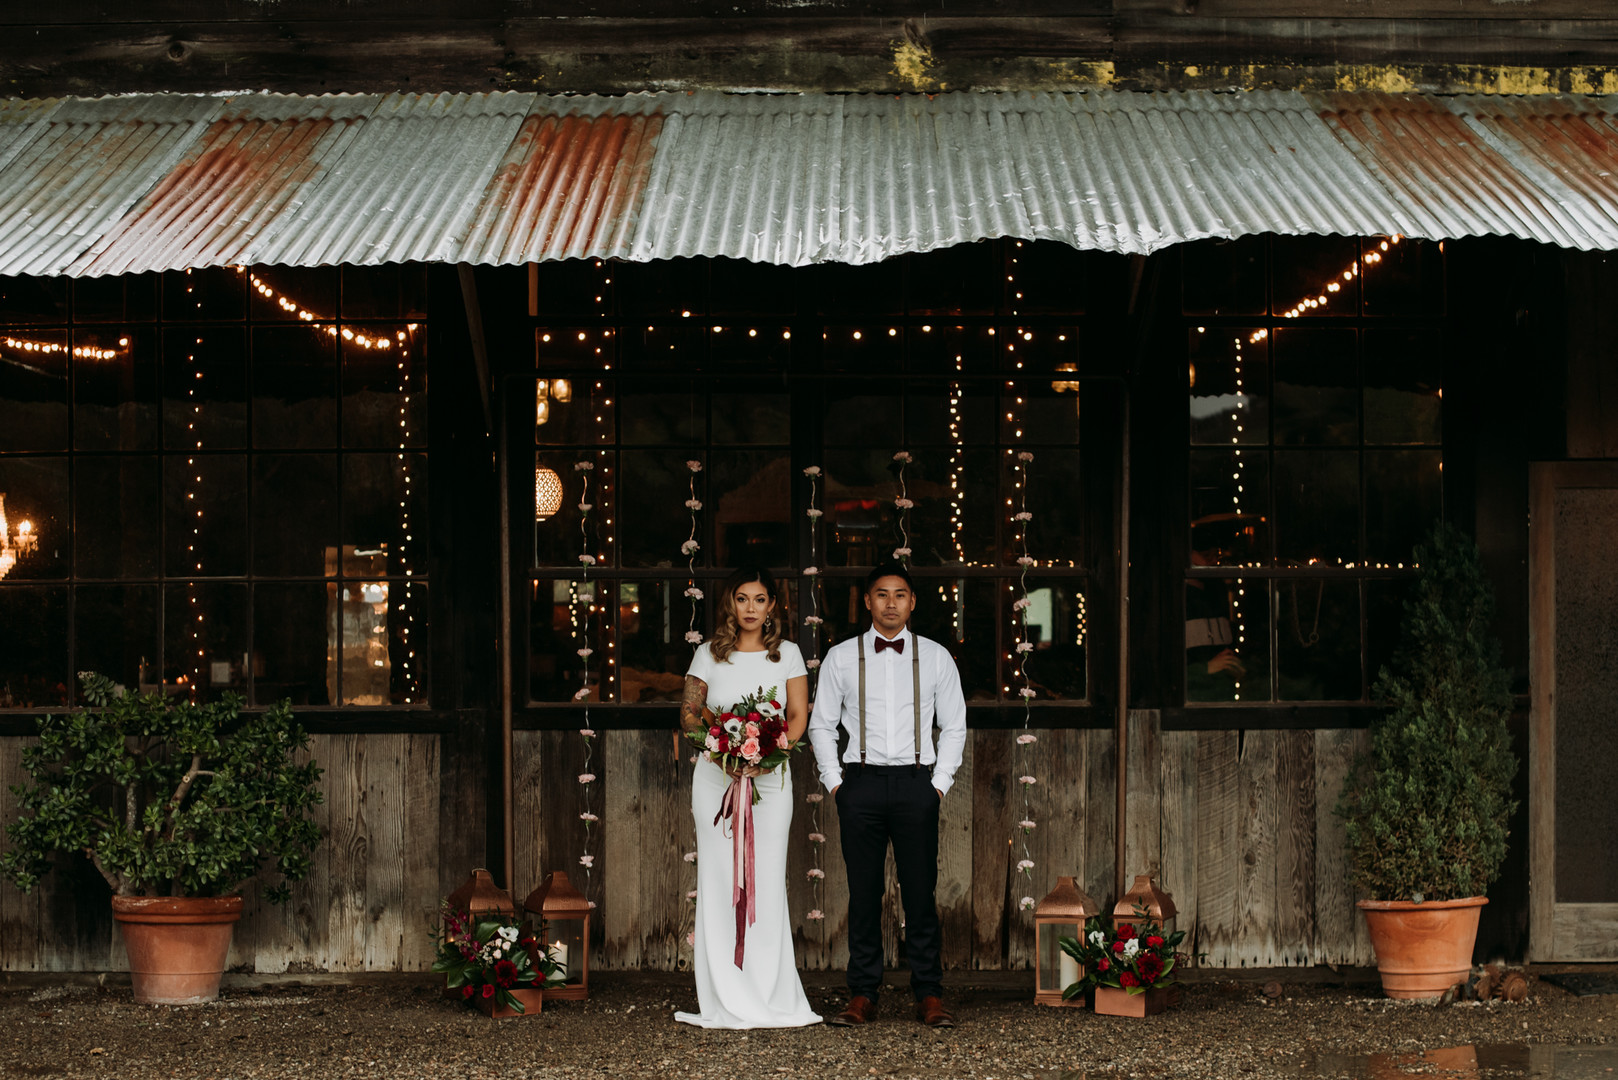 www.santabarbarawedding.com   Kacie Jones Photography   Dana Powers House   FM Events   Flourish Event & Floral Design   Twig and Arrow Salon   bride and groom